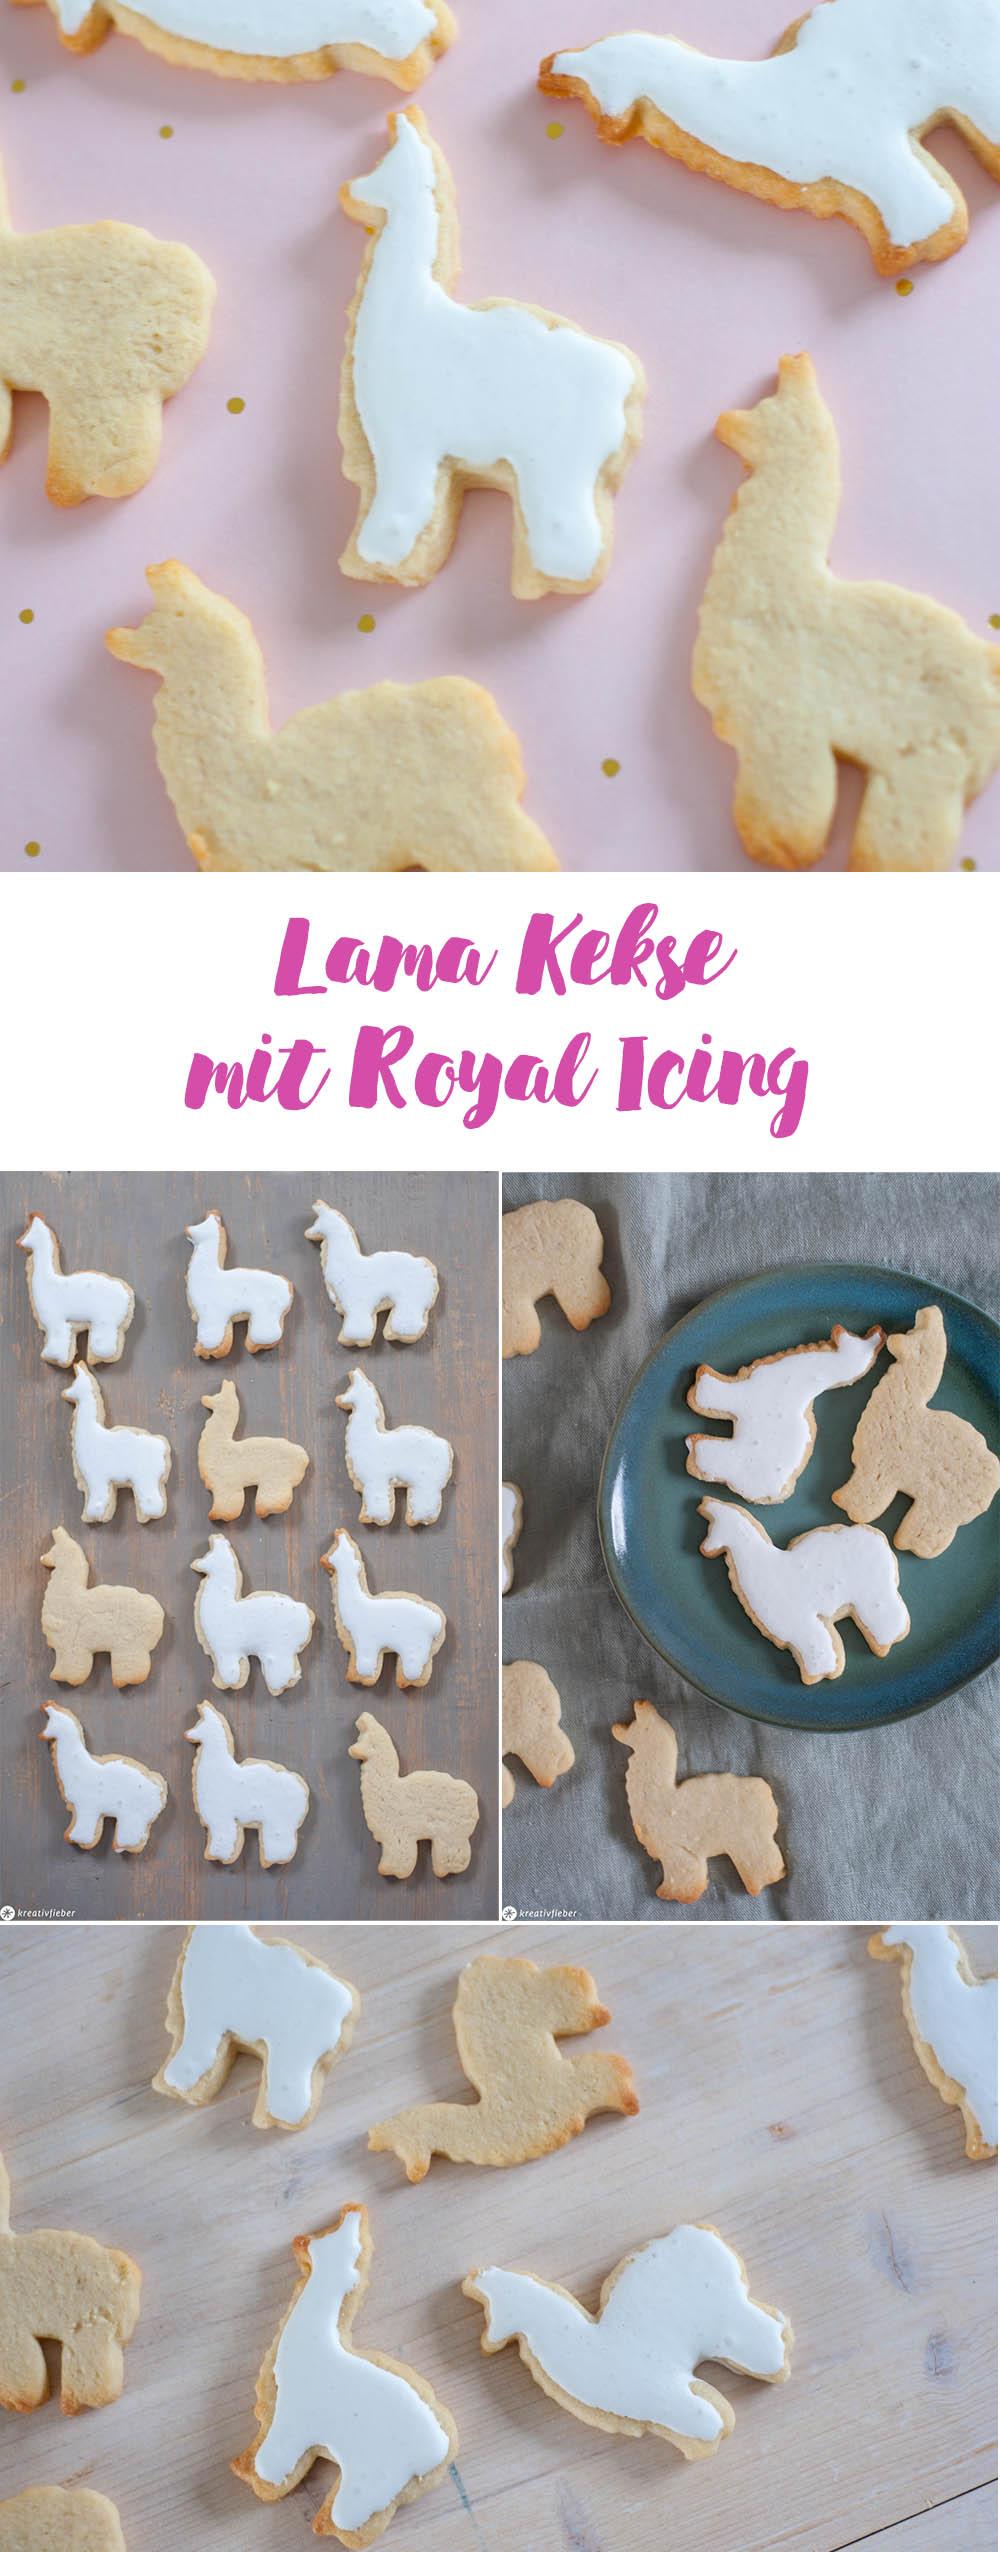 Kekse mit Royal Icing Zuckerguss